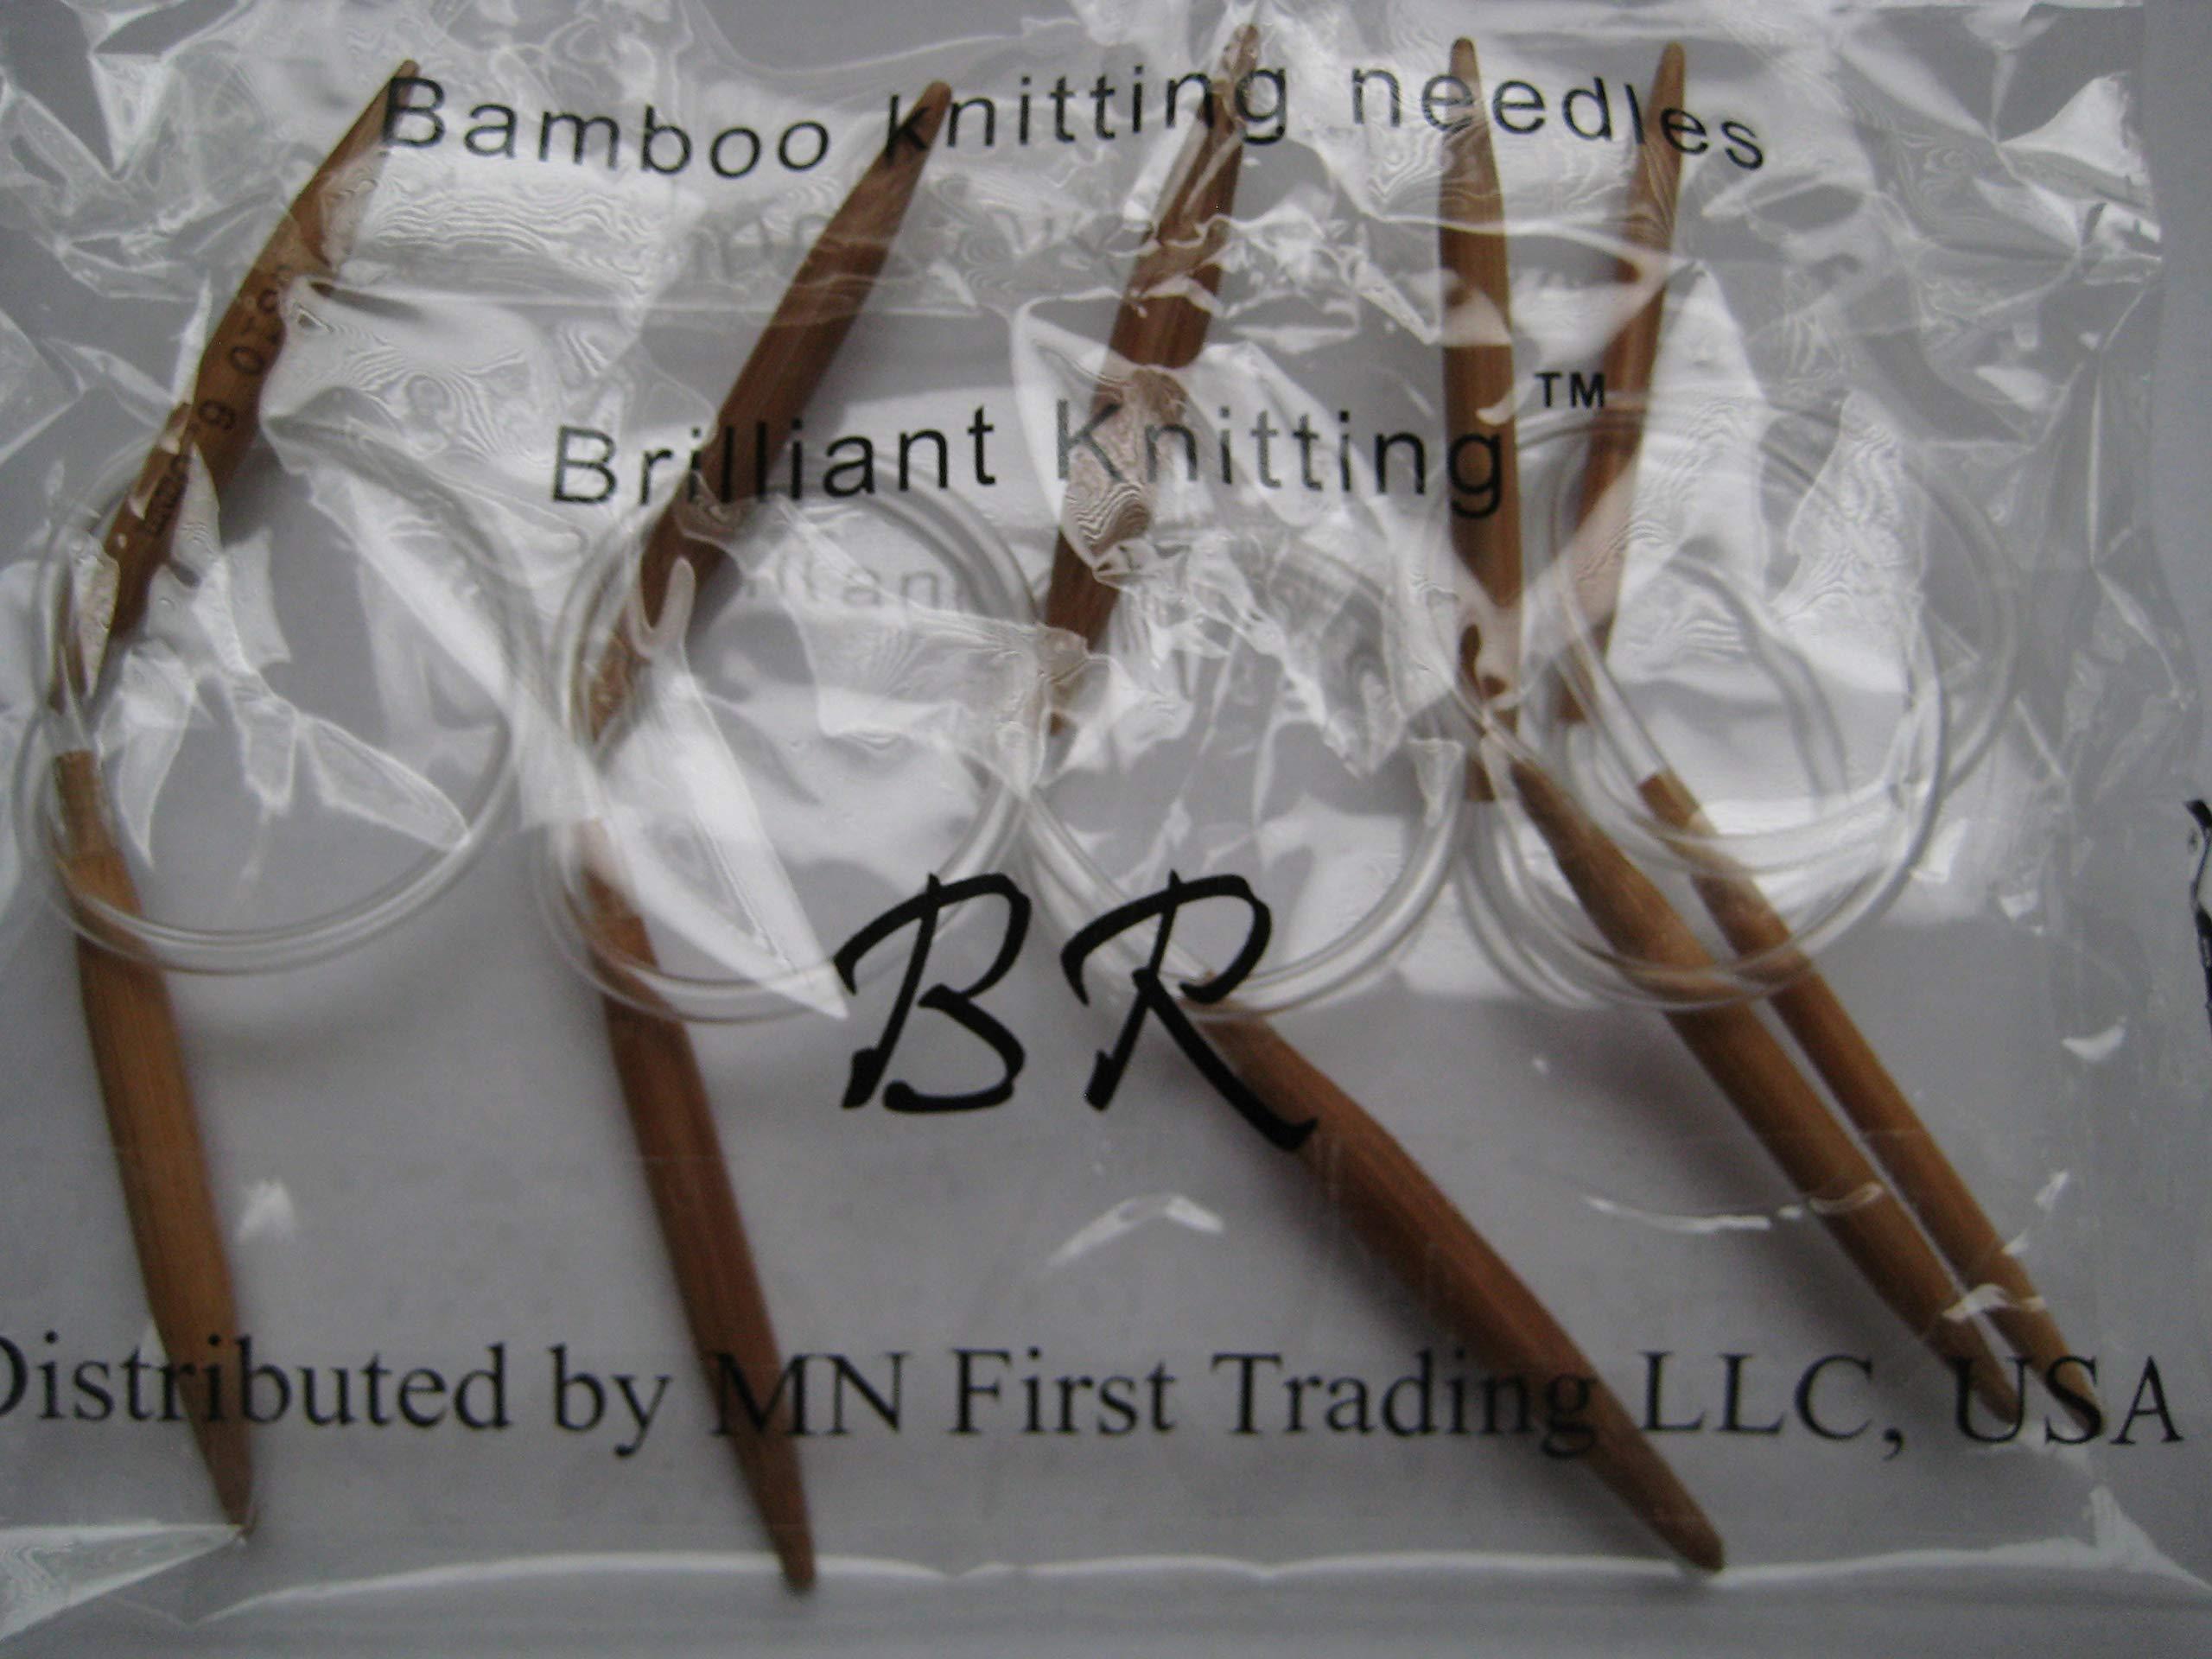 5 Sizes 9'' inches Bamboo Circular Knitting Needles BrilliantKnitting (BR Brand) (US 6, 7, 8, 9, 10) New USA Made tubing, Never Break Again